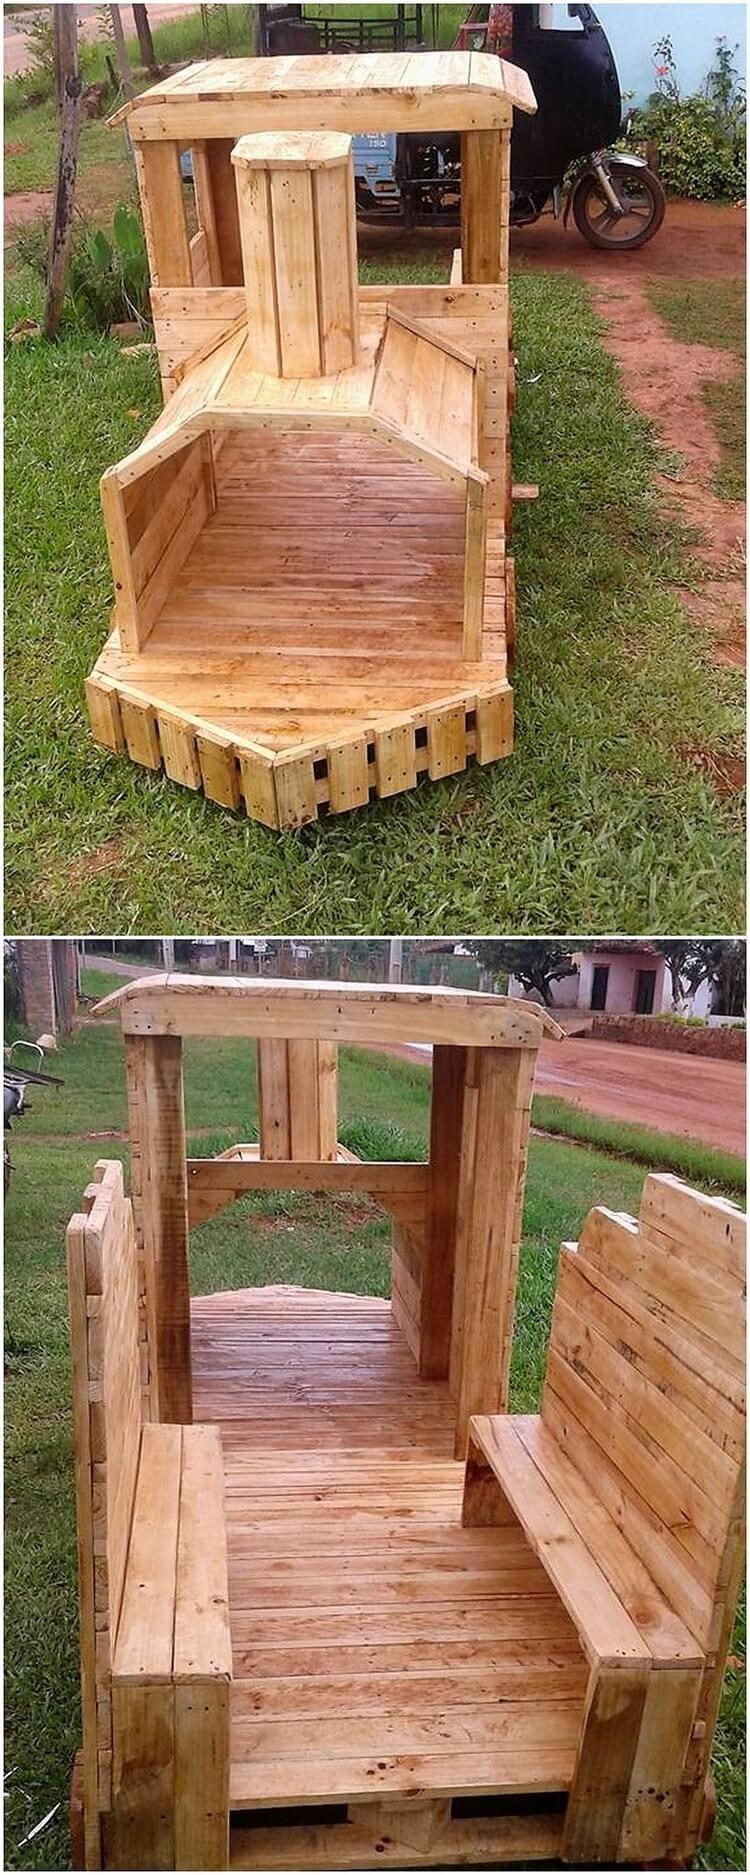 46++ Wood pallets projects ideas info